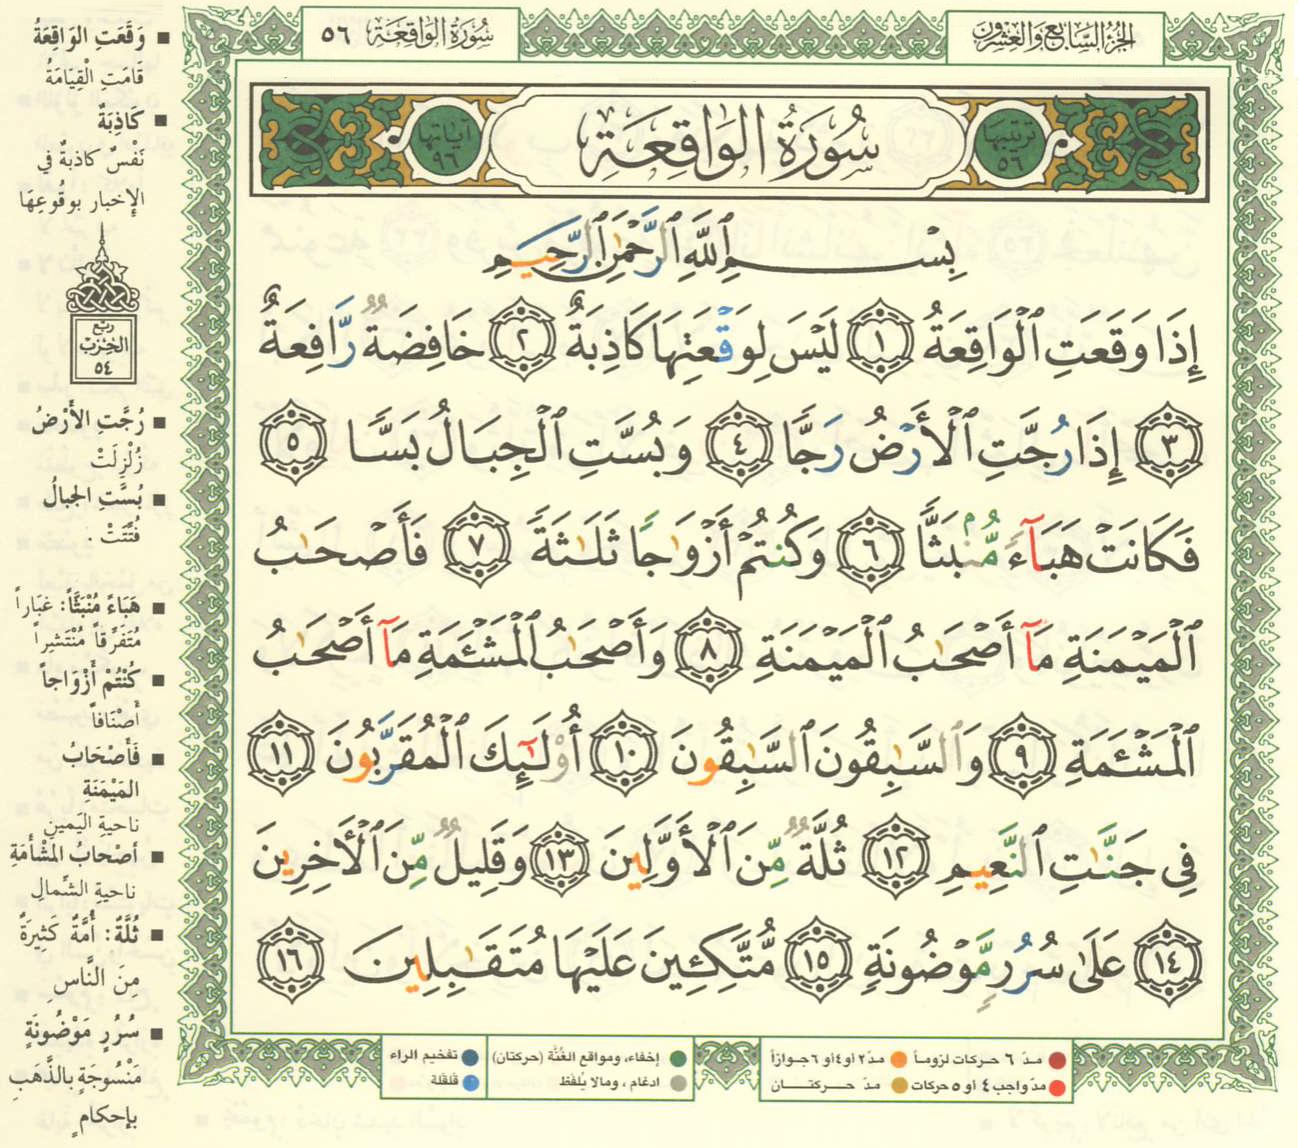 Pin By القران الكريم The Holy Quran On سورة الواقعة Holy Quran Quran Bullet Journal